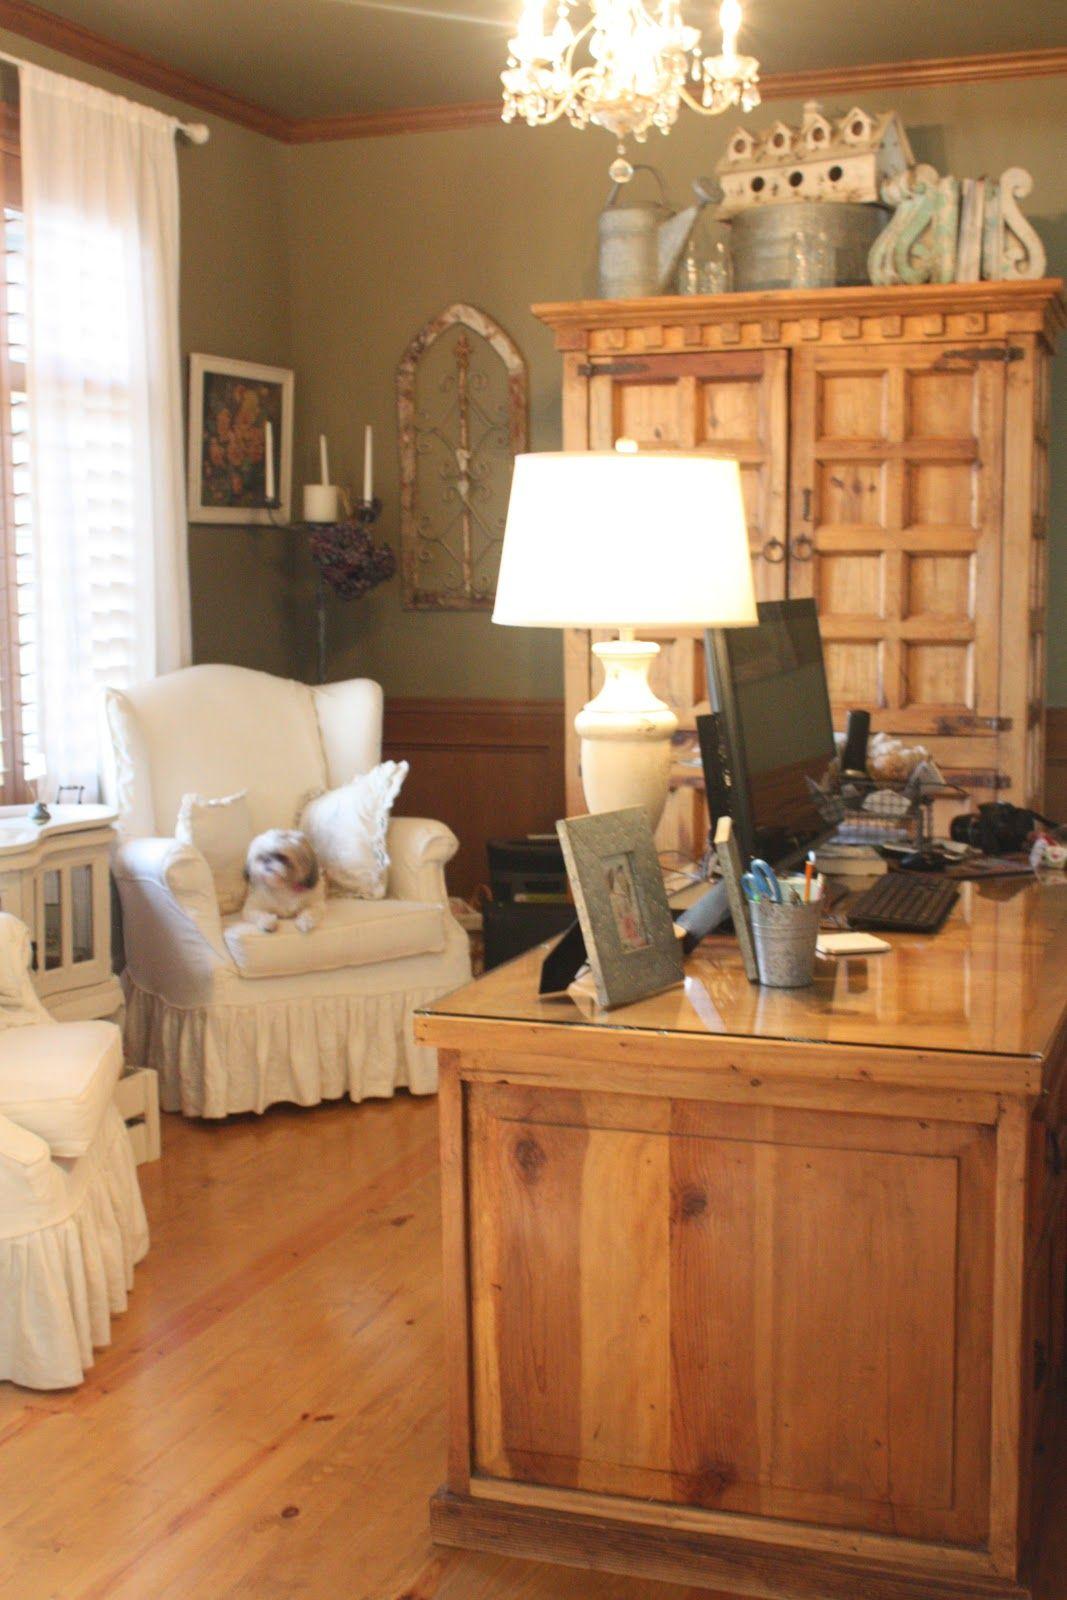 Home-office-innenarchitektur inspiration my sweet savannah fishtail cottage  studios and offices